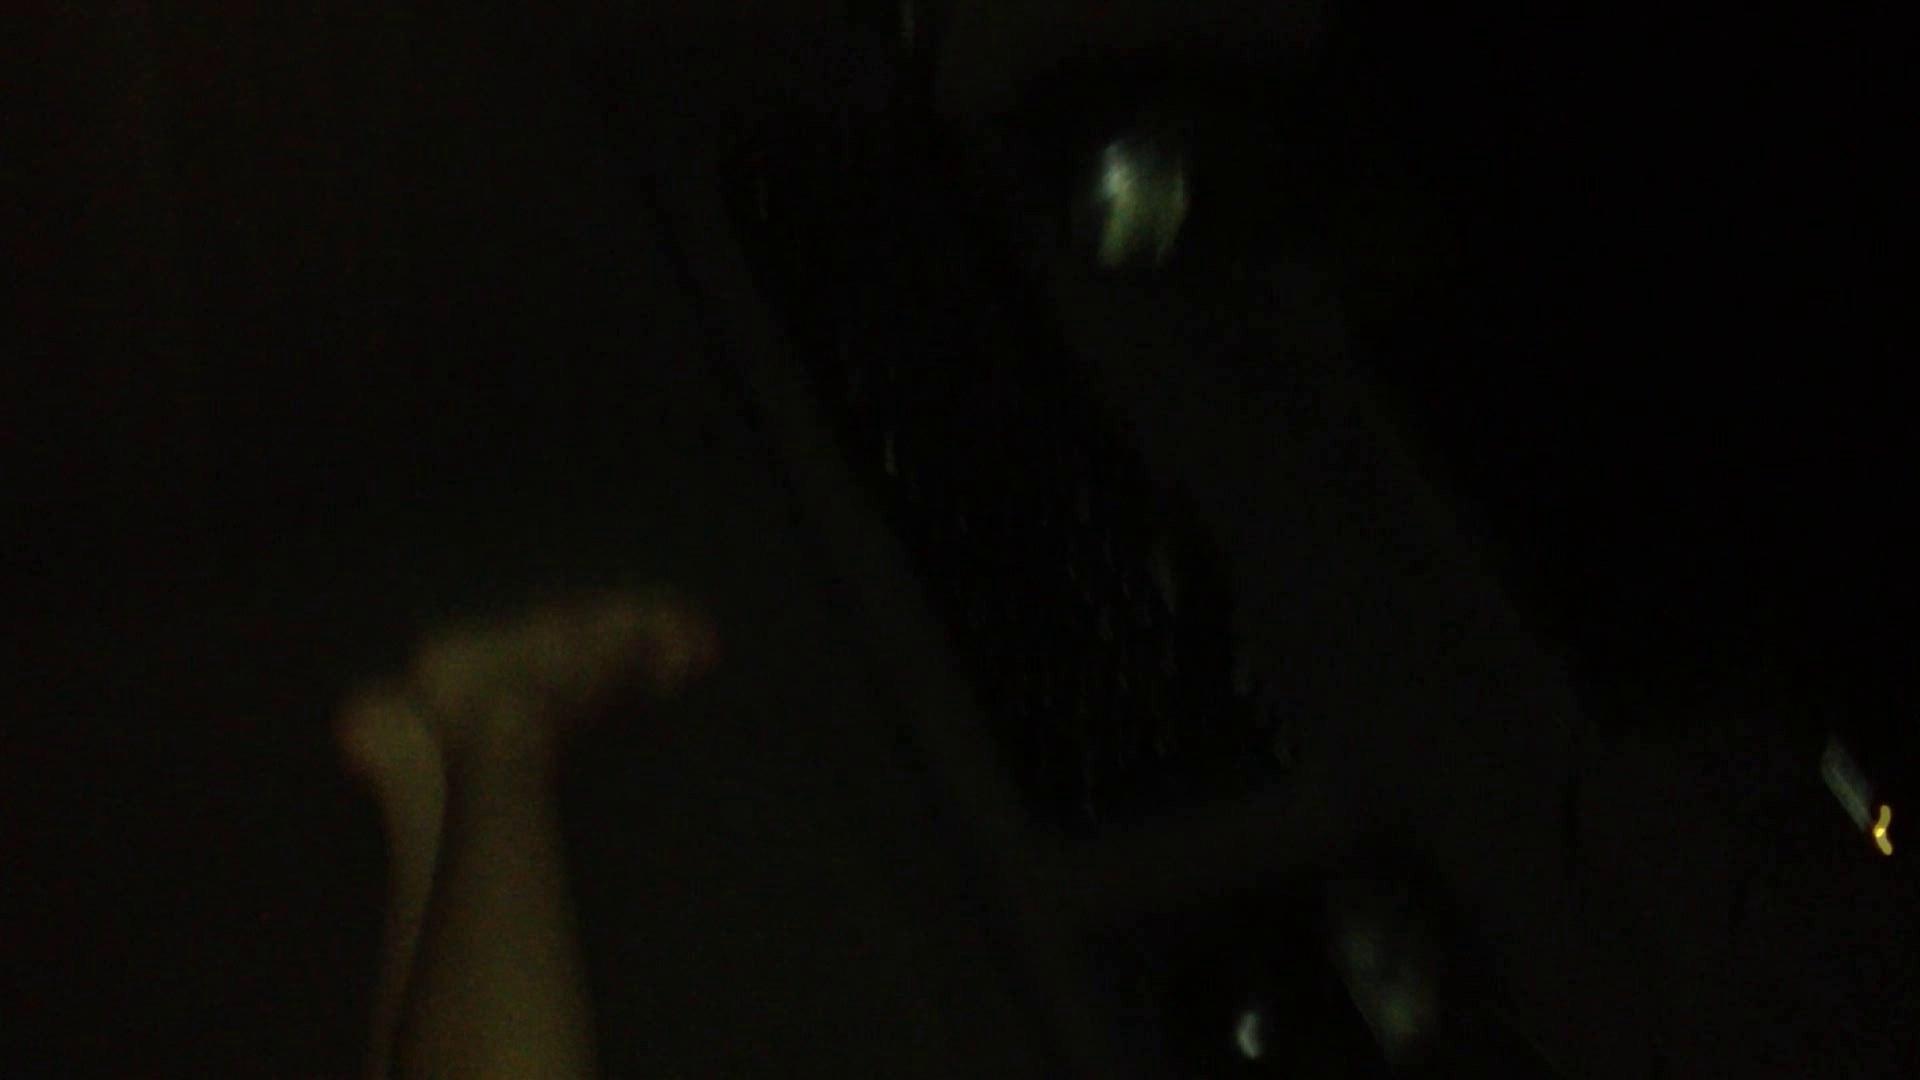 vol.45 【YMちゃん】現役JD純白パンツのお嬢様 パンツの中は。。 ワレメ無修正動画無料 63PIX 15